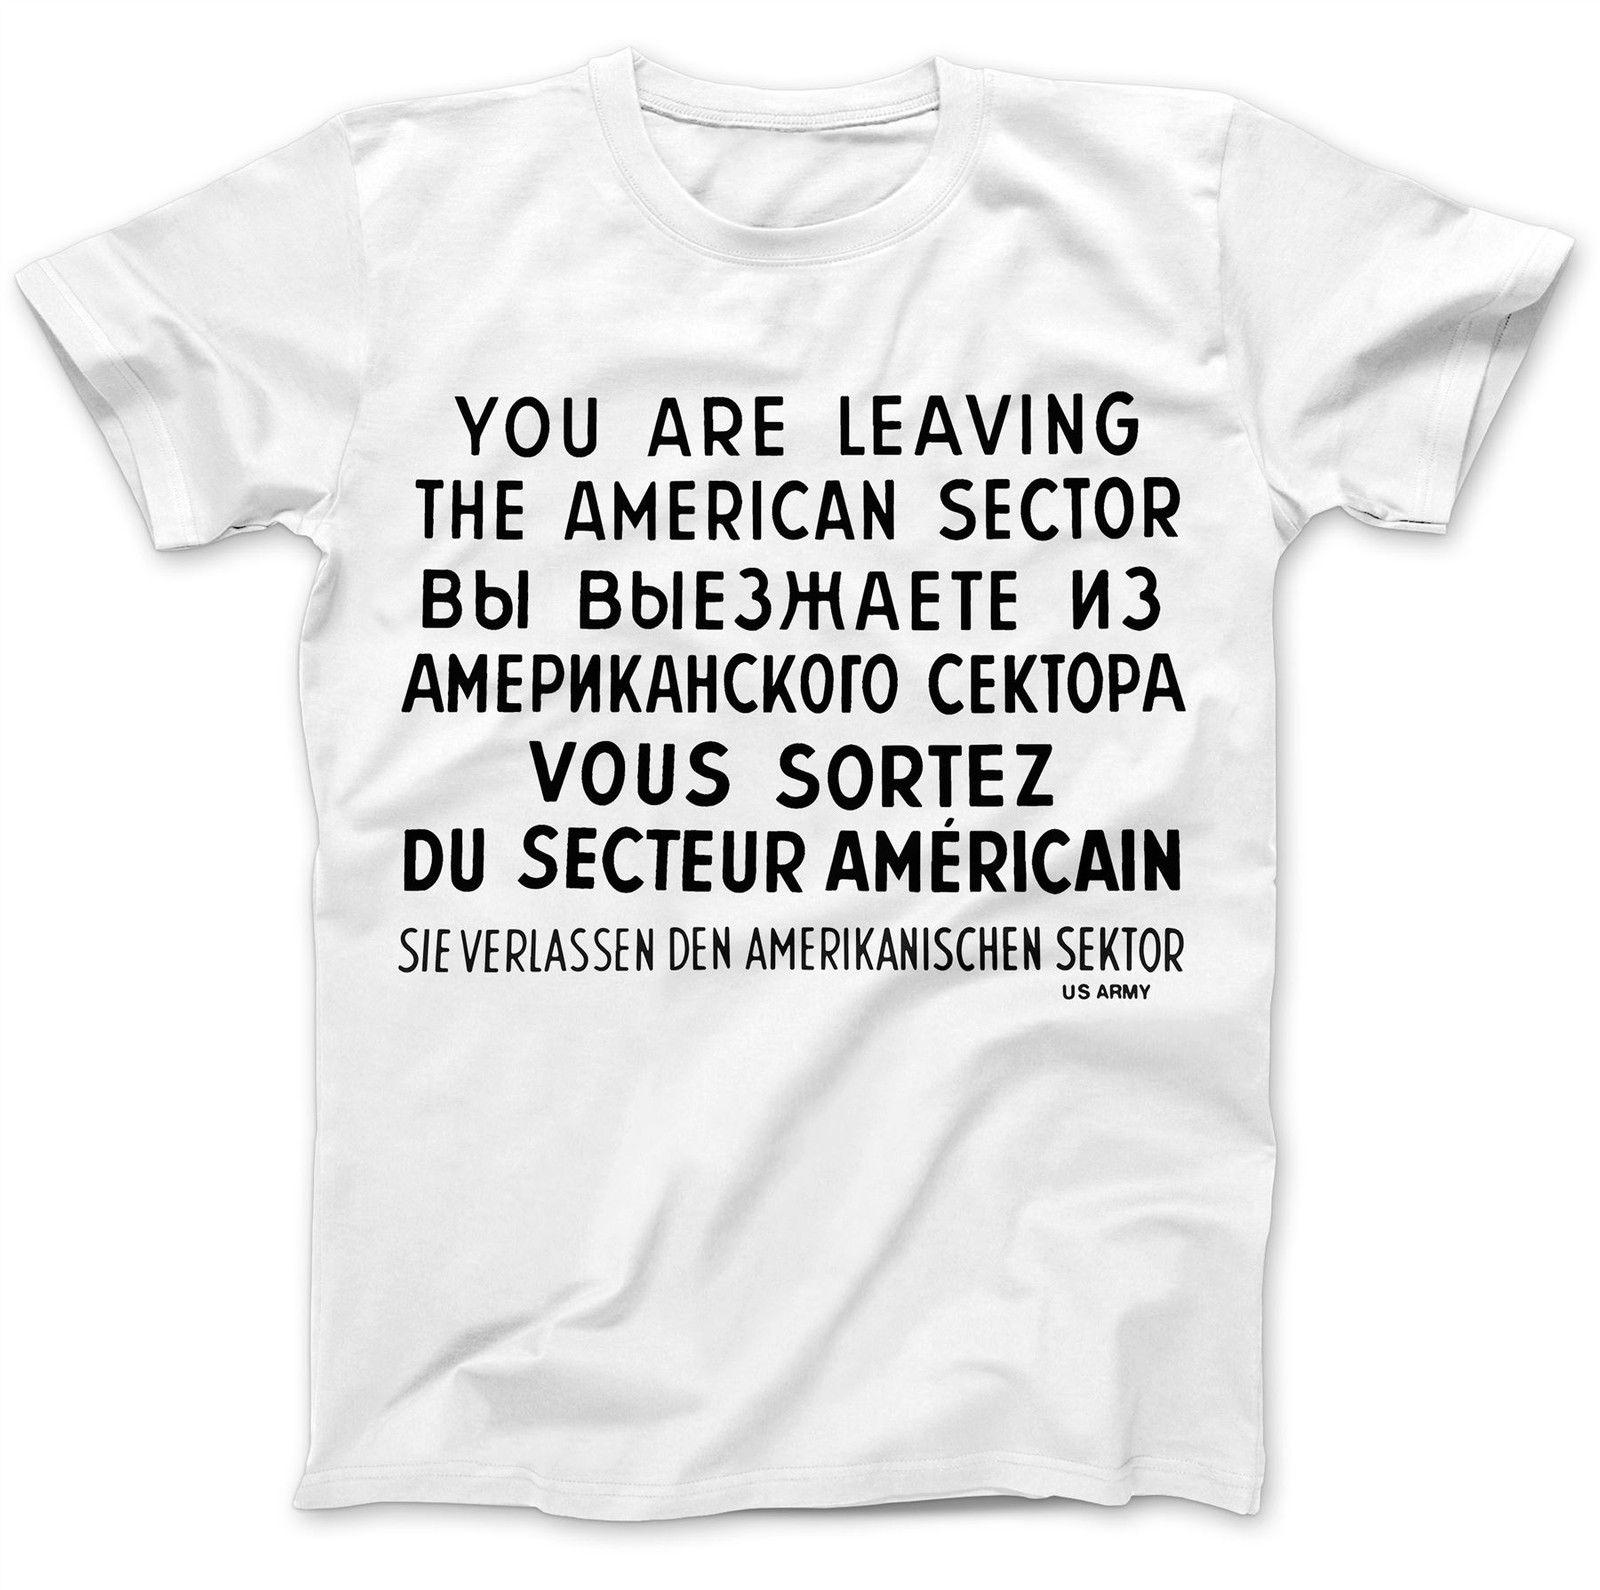 Checkpoint Charlie Berlin T-Shirt 100% Premium Cotton WW2 Communism Mens Hipster Short Sleeve Tee Tops T Shirt The New